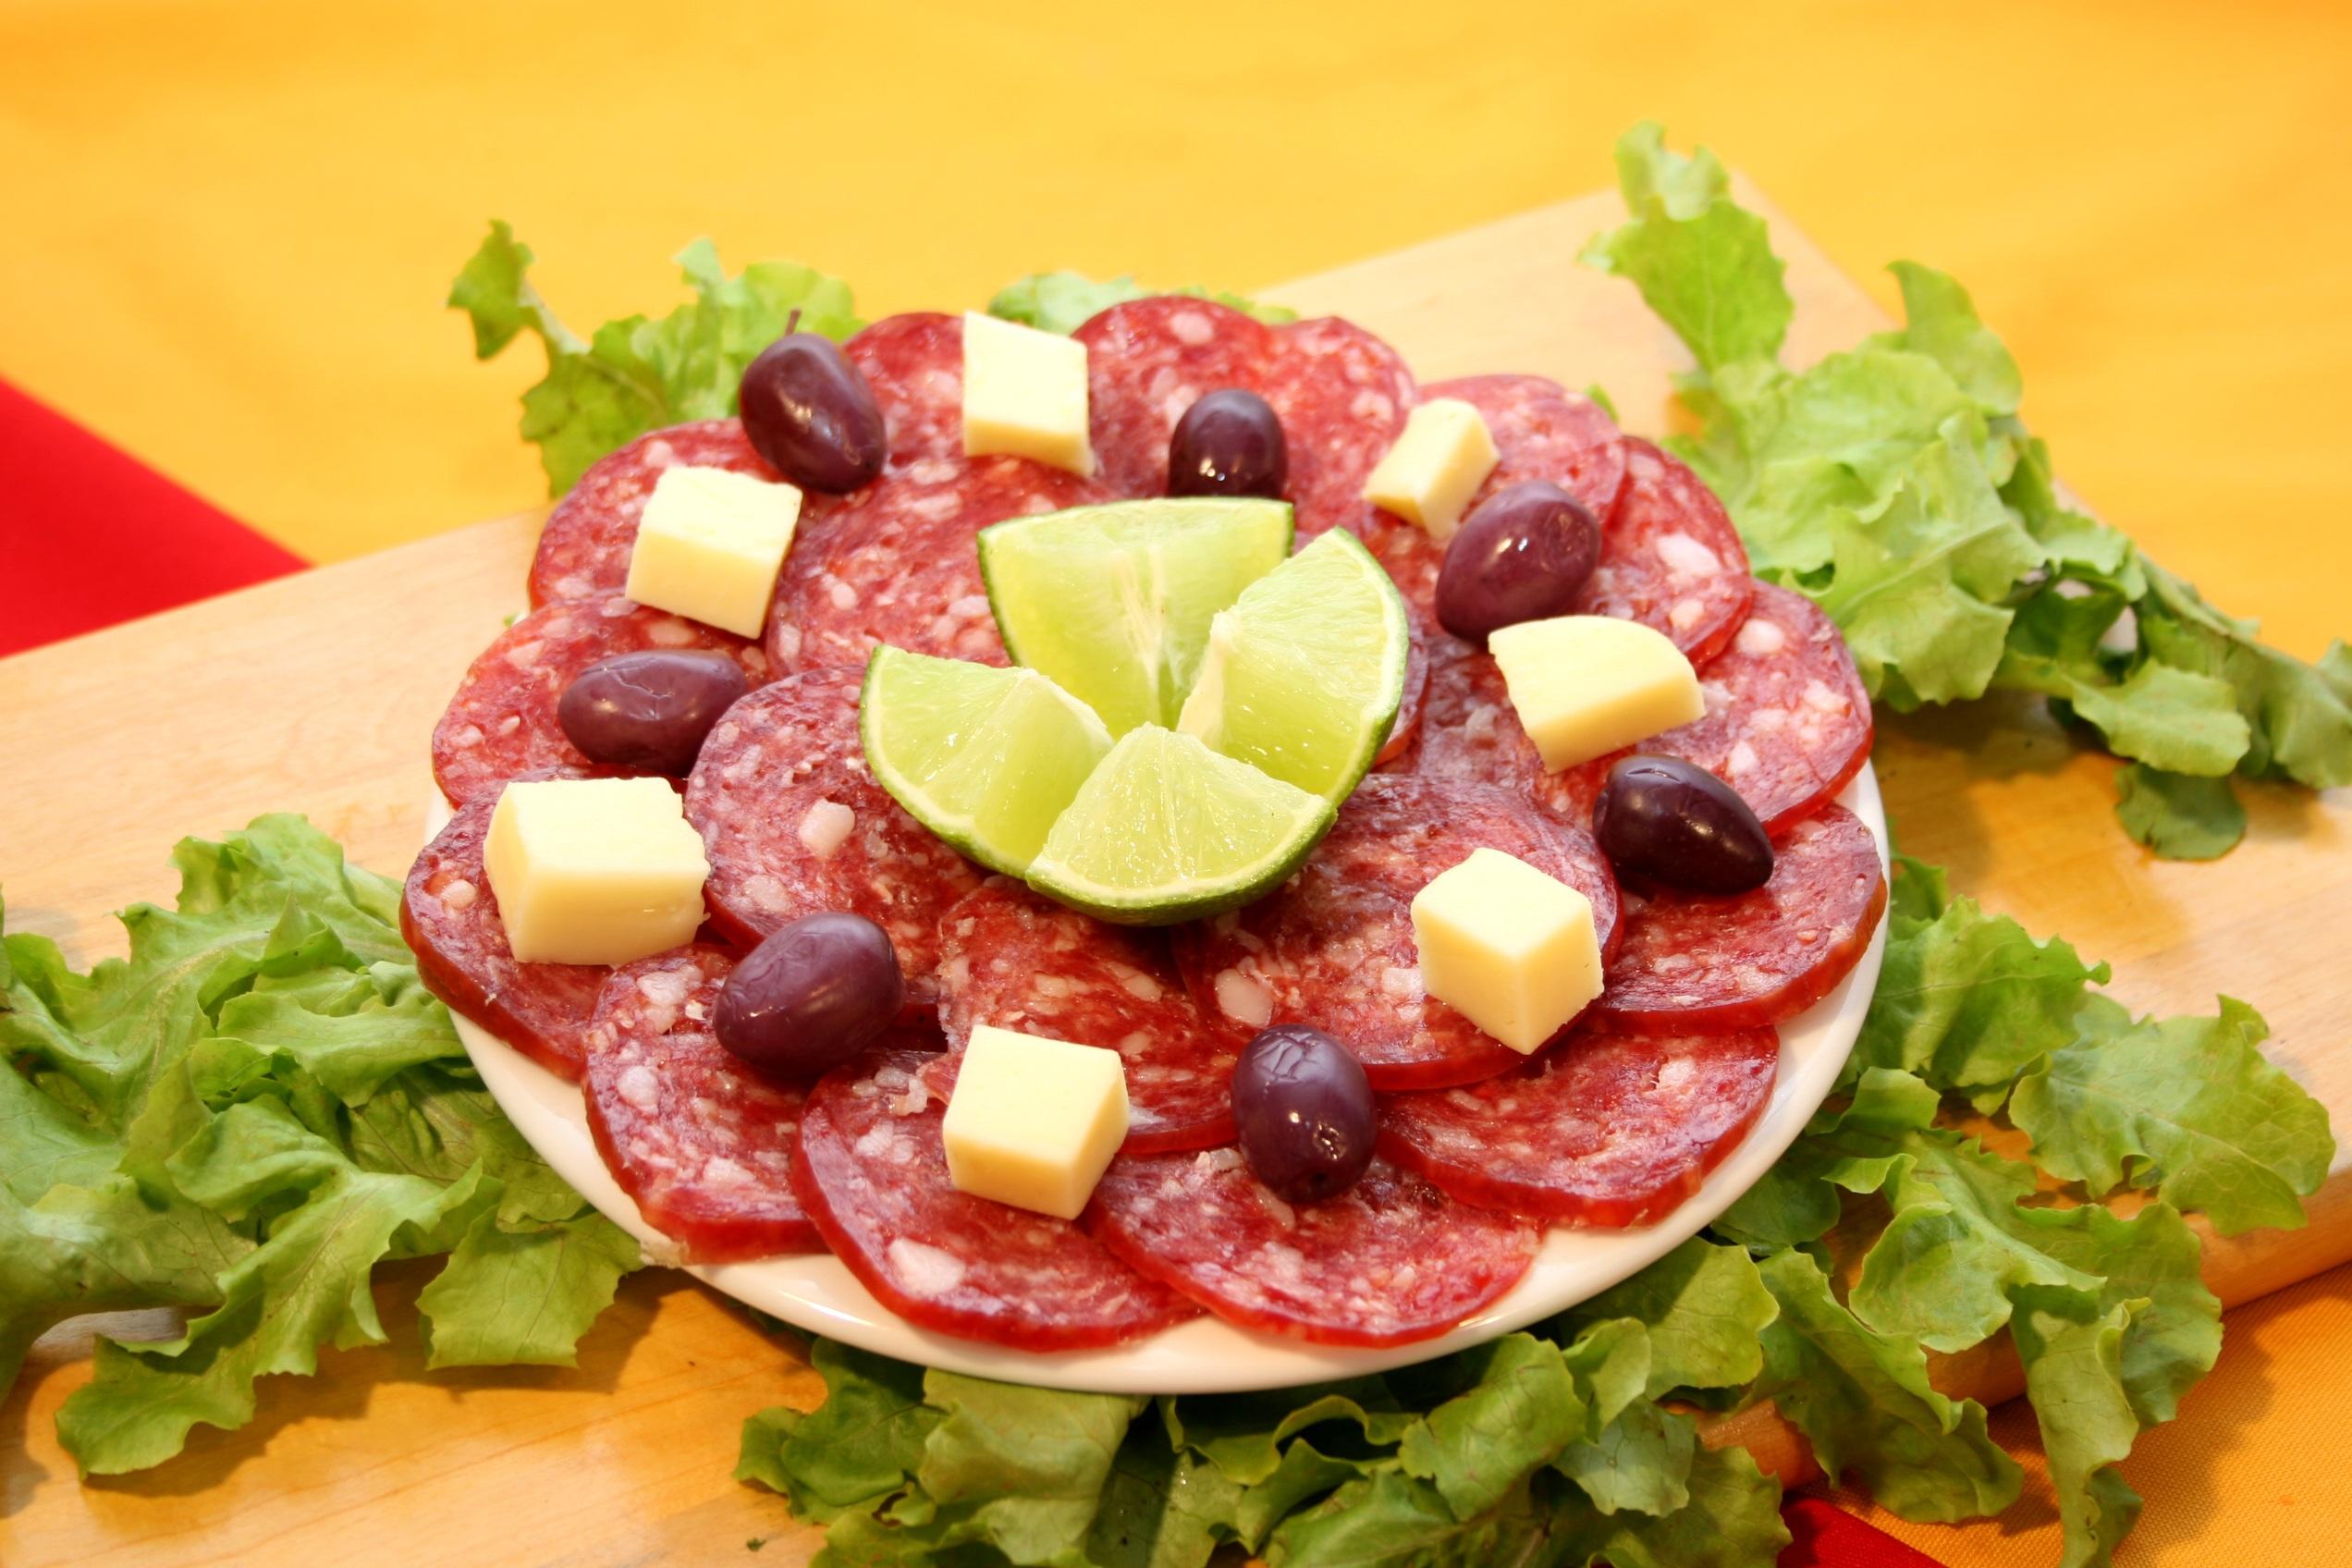 Fotos gratis : plato, ensalada, vegetal, receta, bocadillo, carne ...